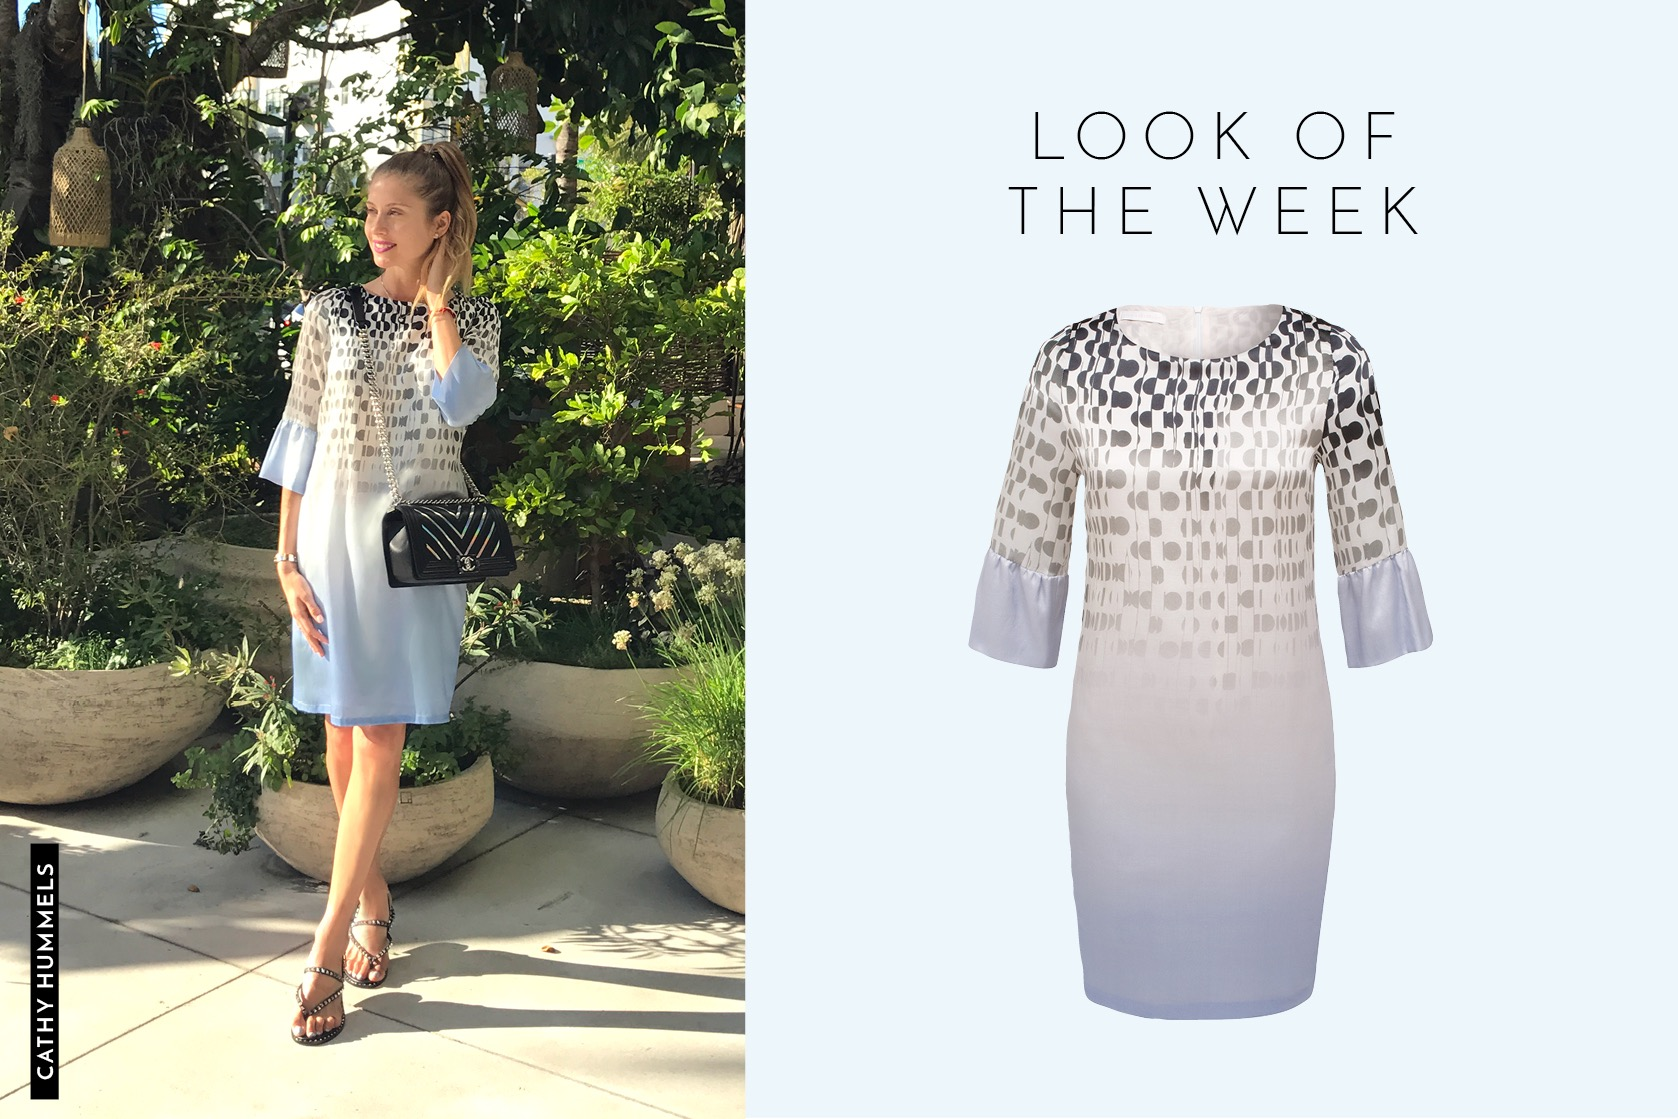 Little Spring Dress - Look of the Week